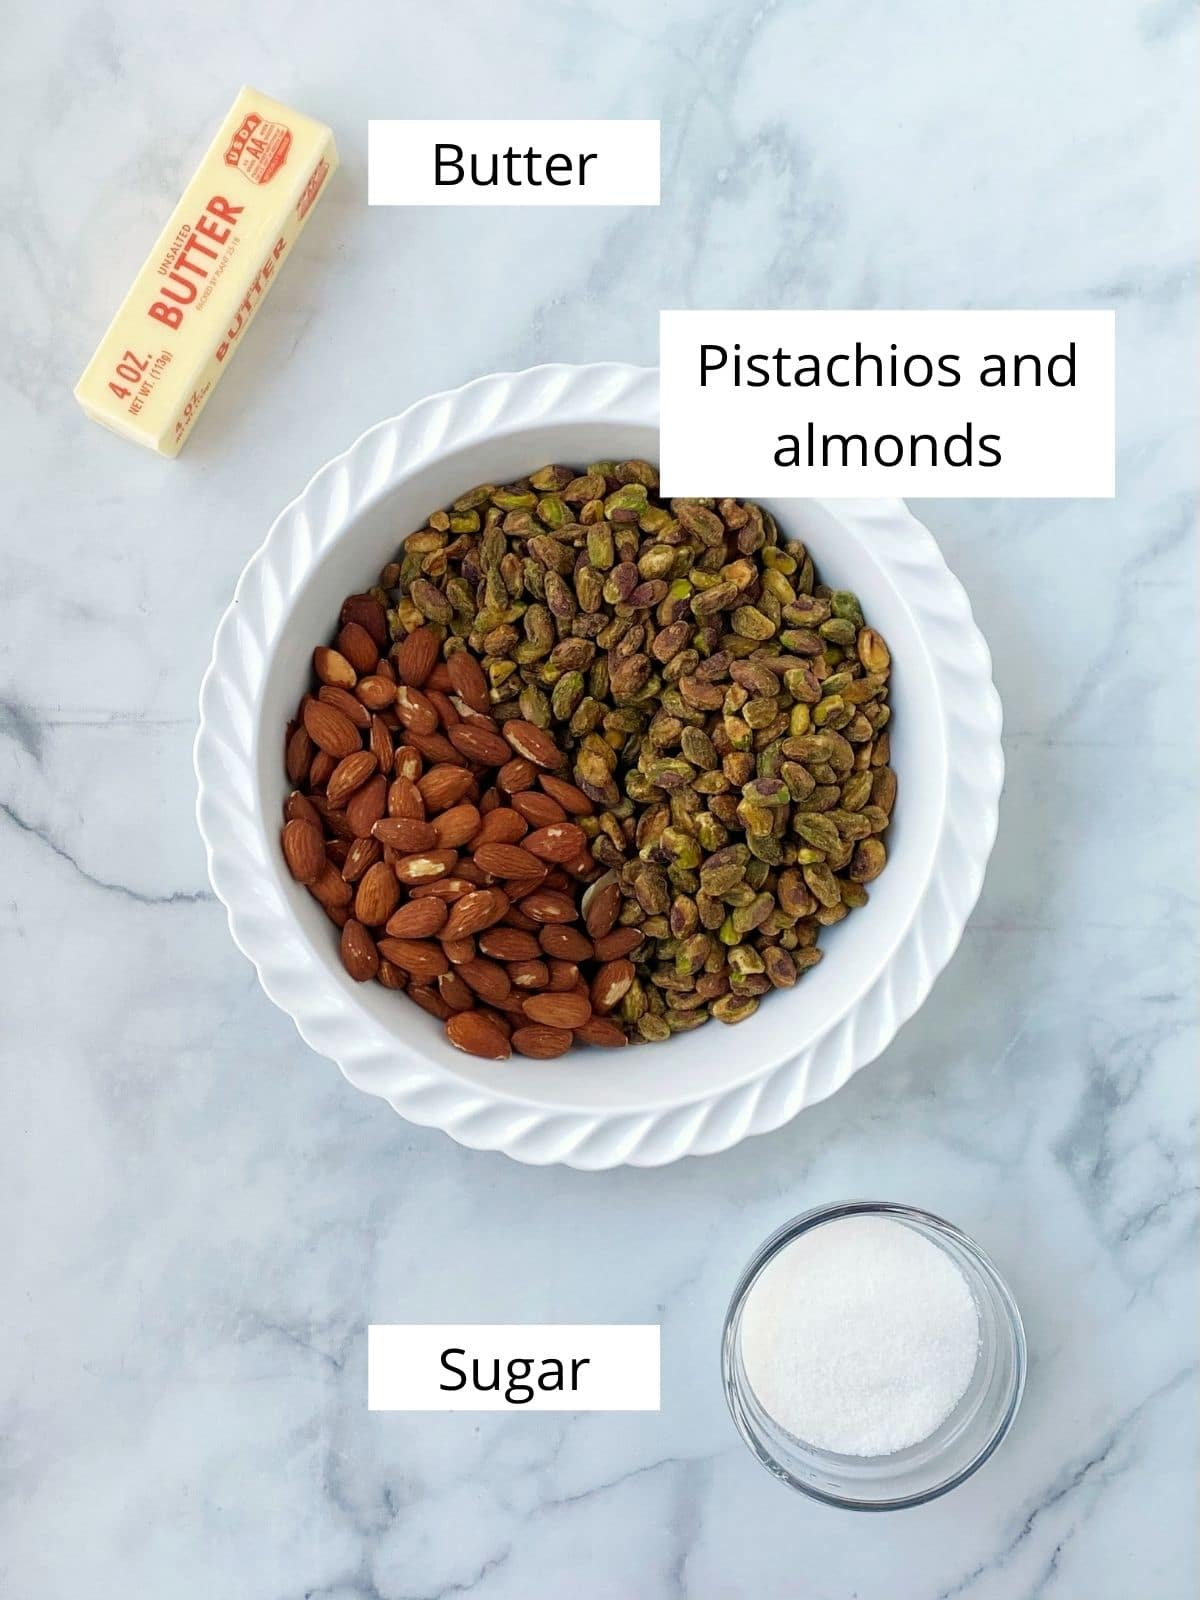 crust ingredients - nuts, butter, sugar